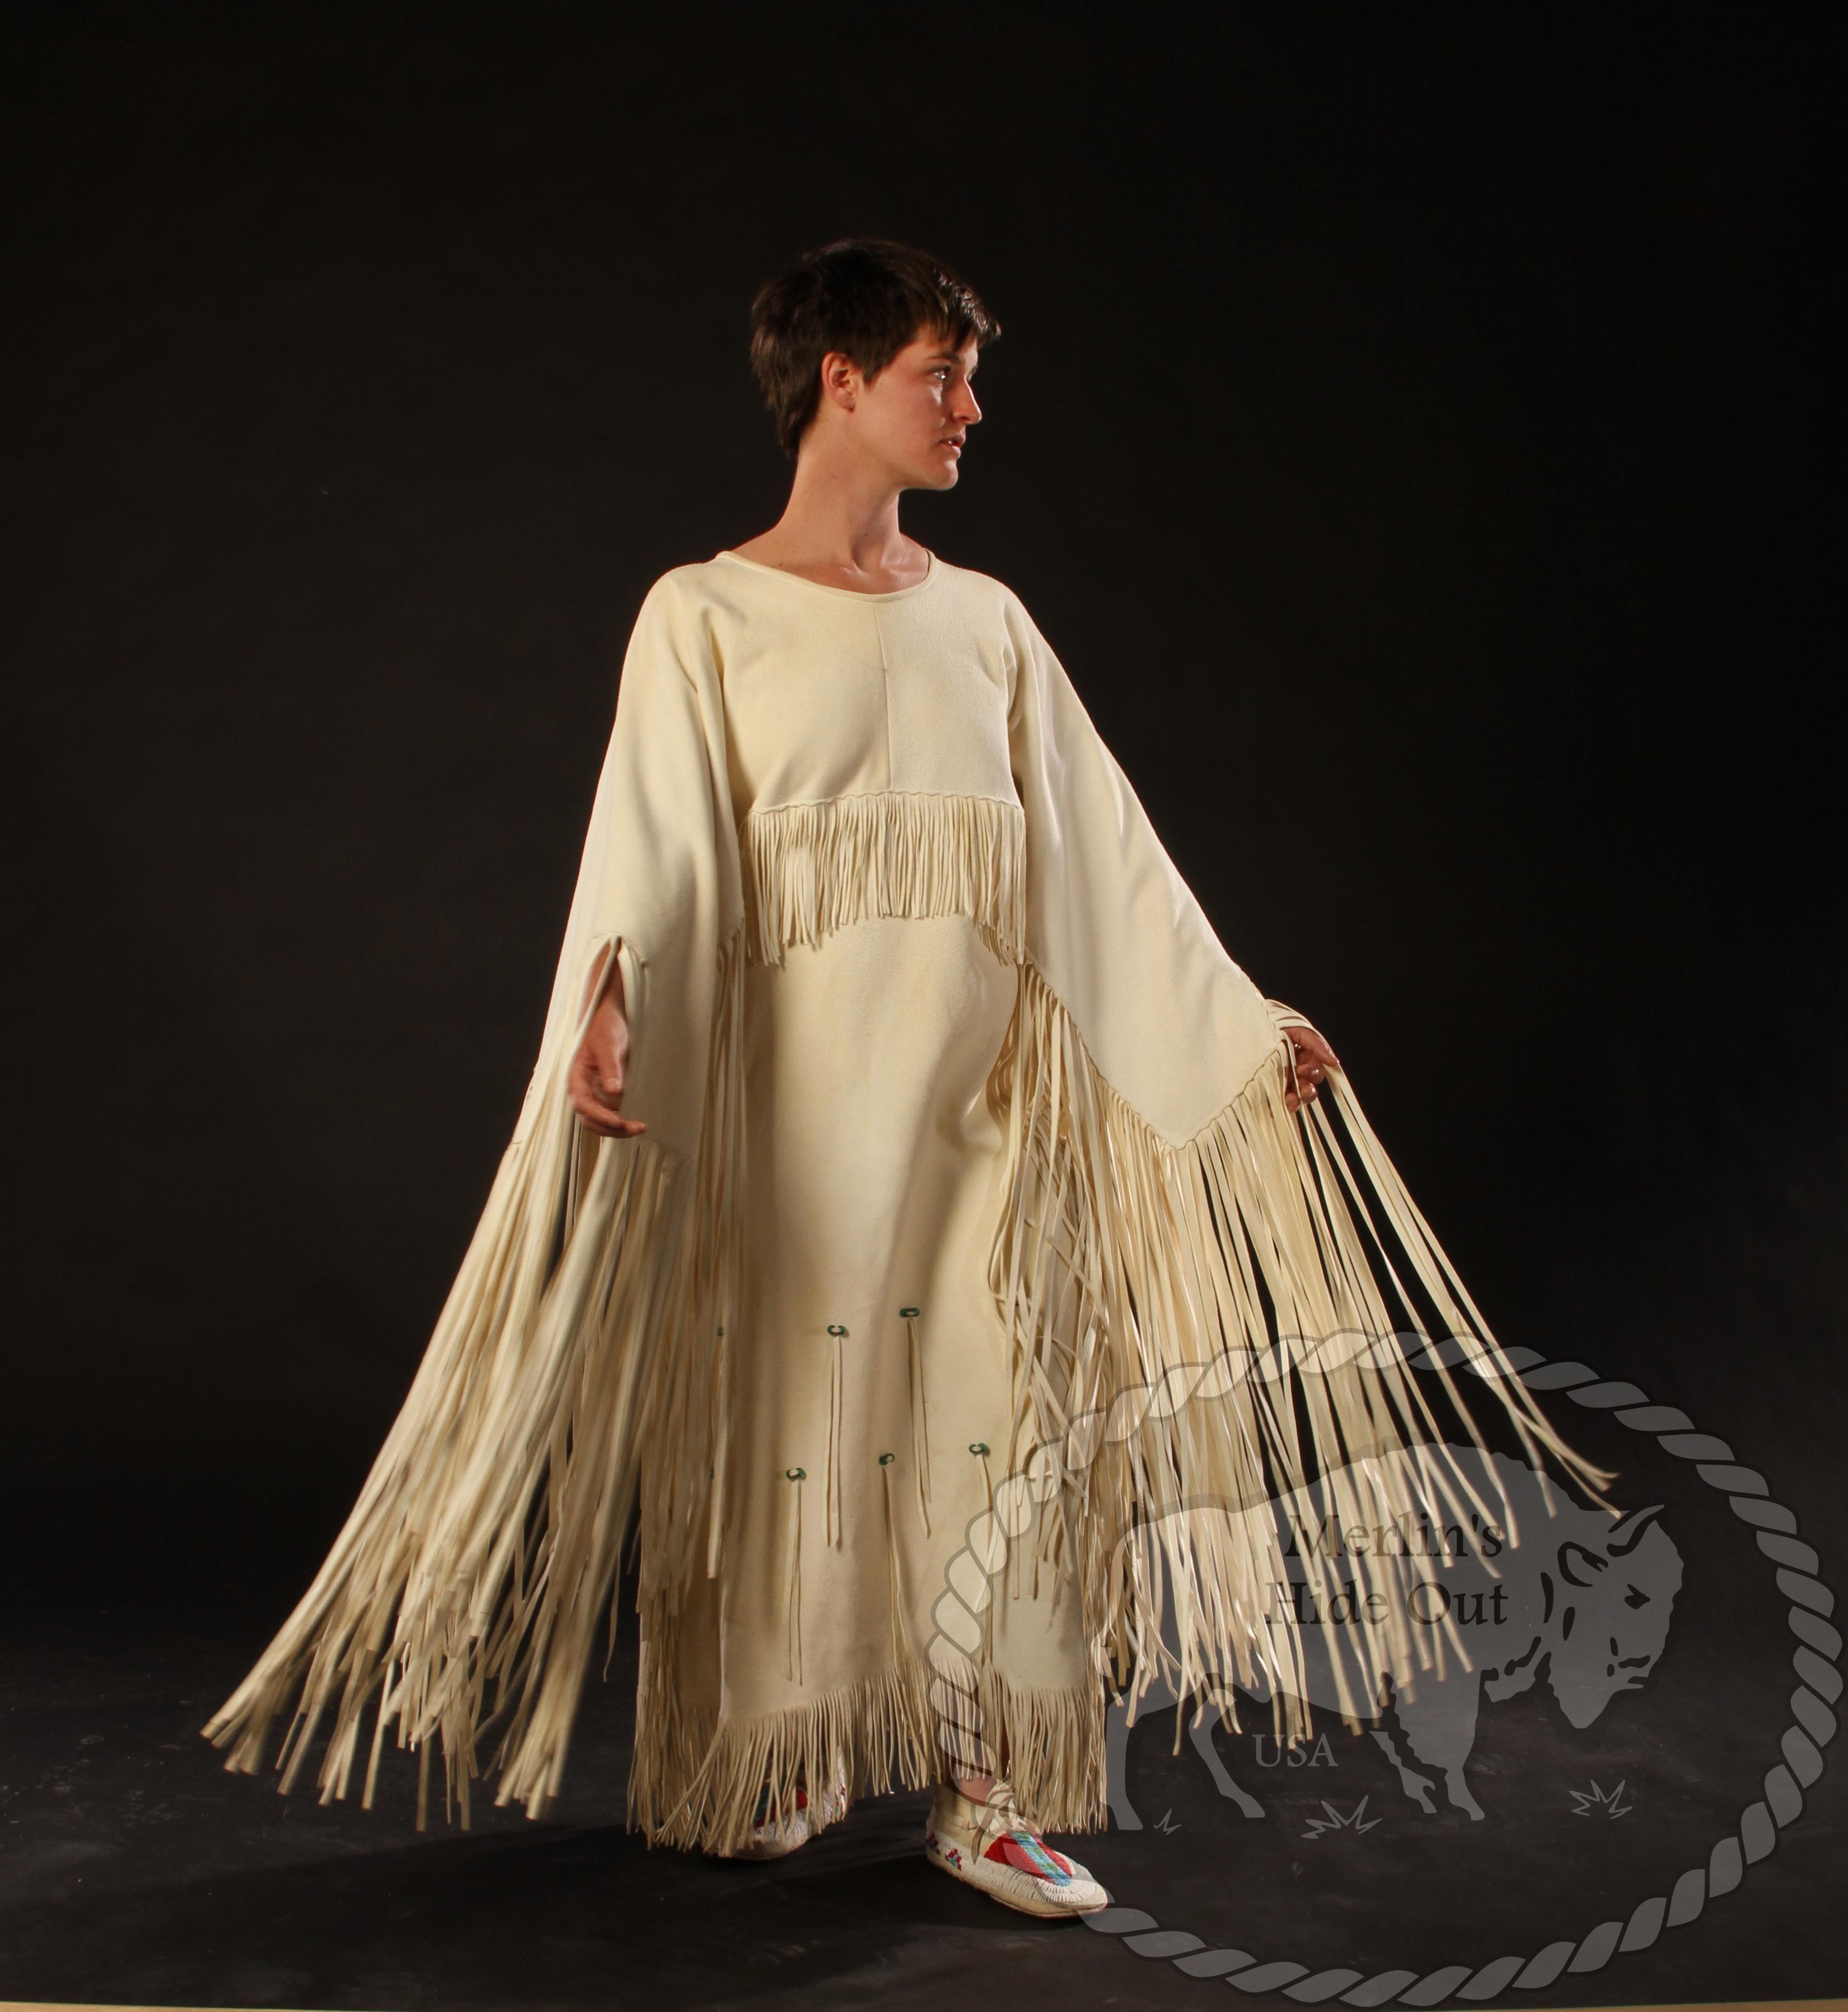 native american navajo traditional dresses bl1ESLO jra hjE* kWw native american wedding dress Pin By Sandy Cabrera Thompson On Native American Items Pinterest Traditional Native American Wedding Dresses